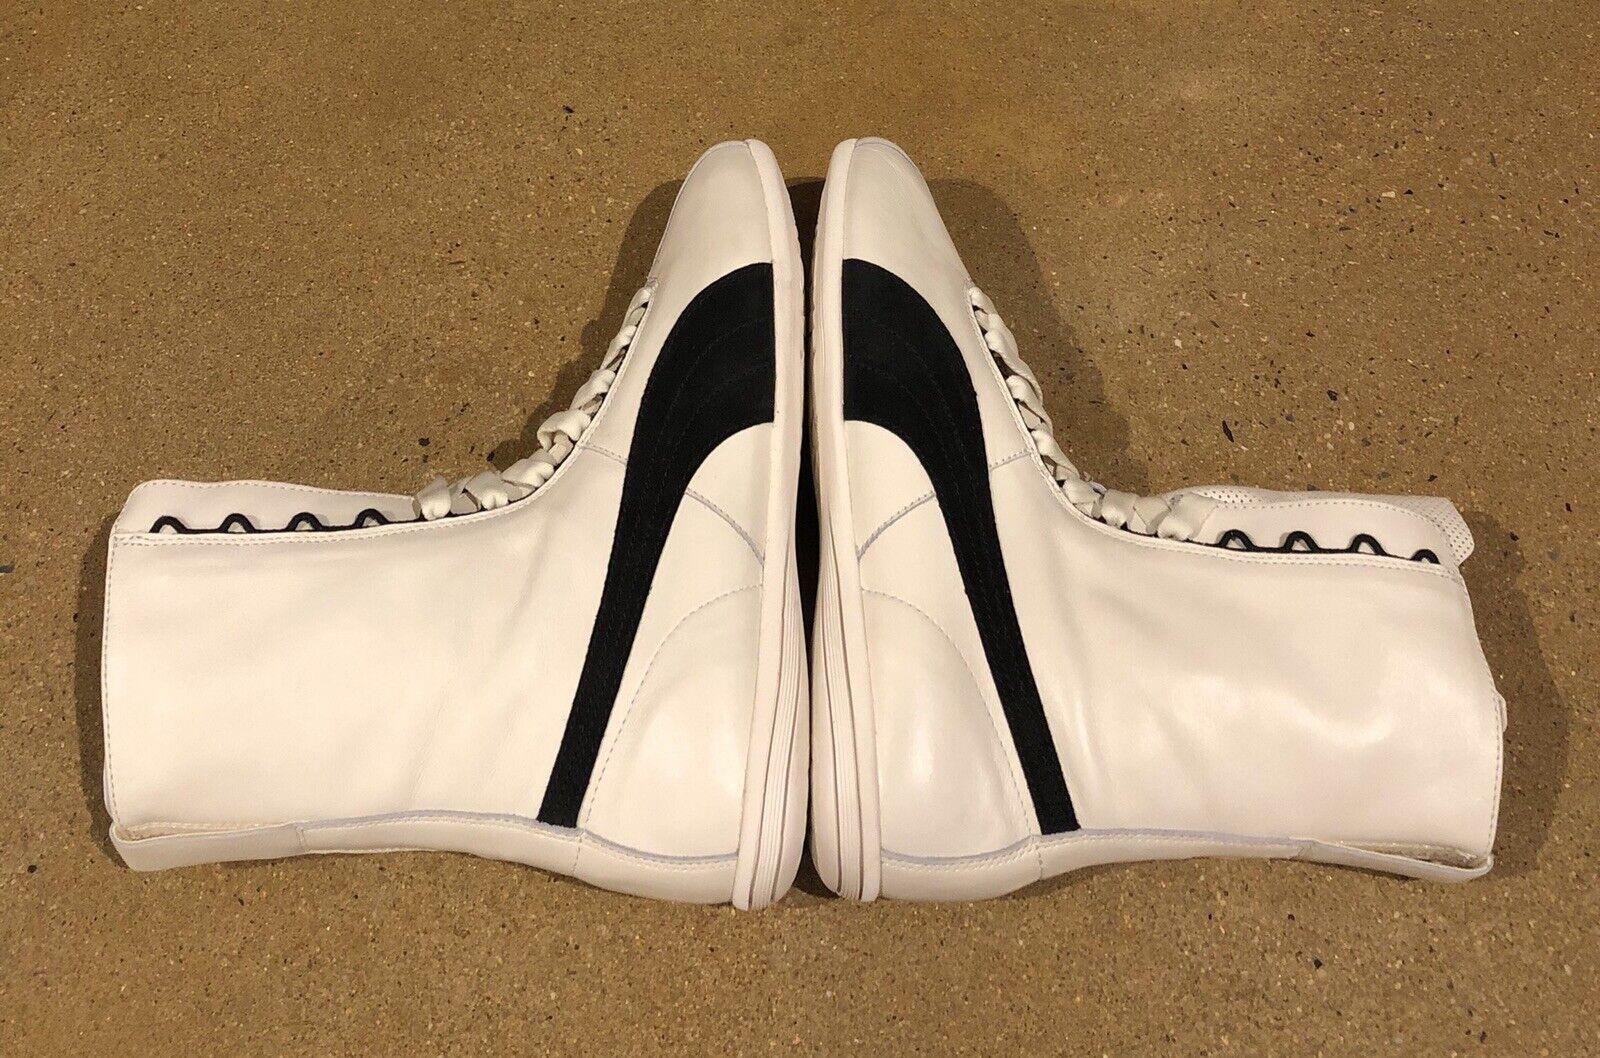 Puma Eskiva Hi Top White Leather Boxing  Fashion Sneakers shoes Womens 10 US